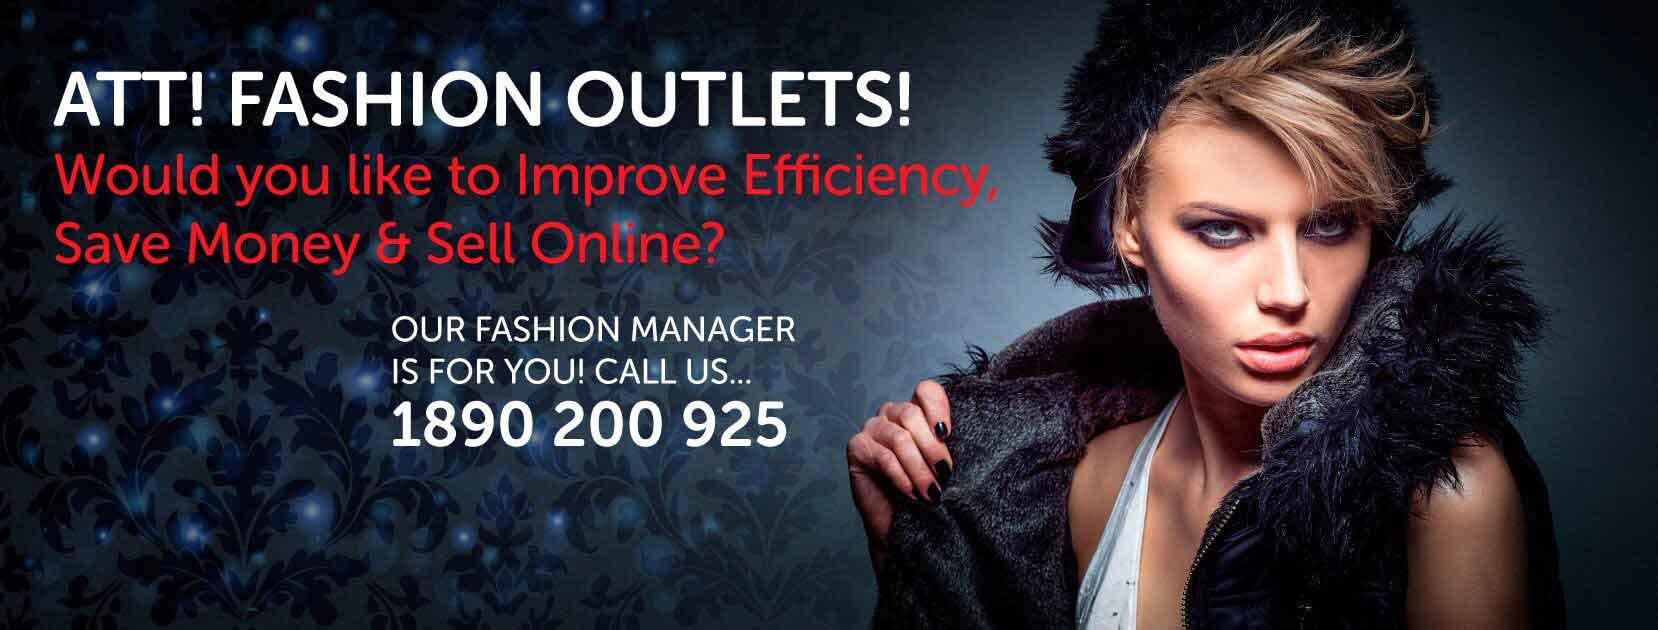 epos systems for fashion